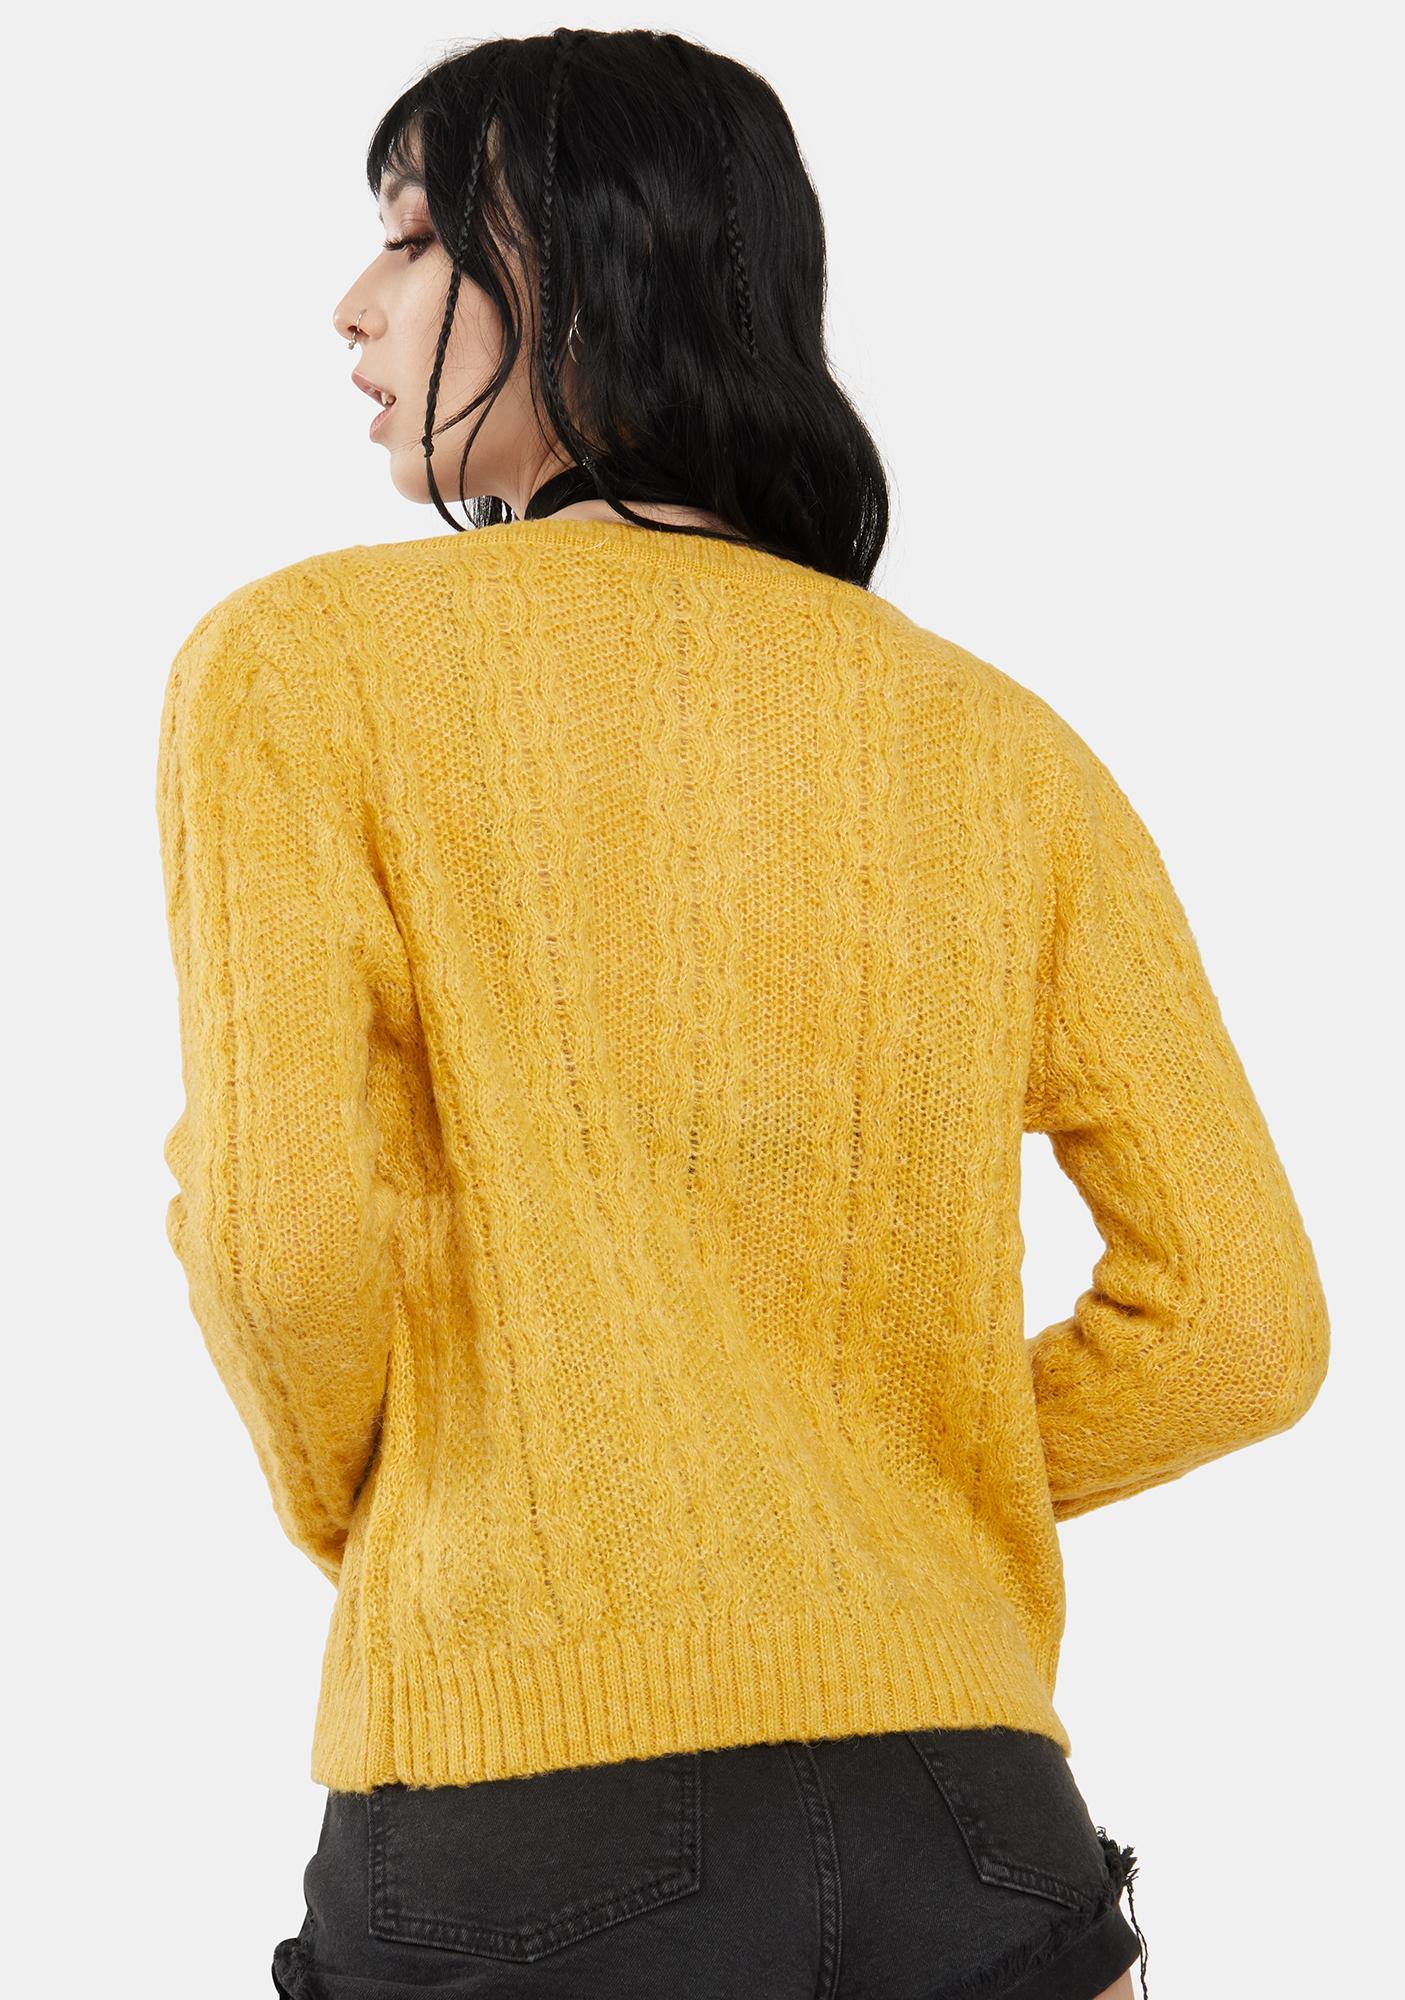 Dress Forum  Honey Yellow Knit Cardigan